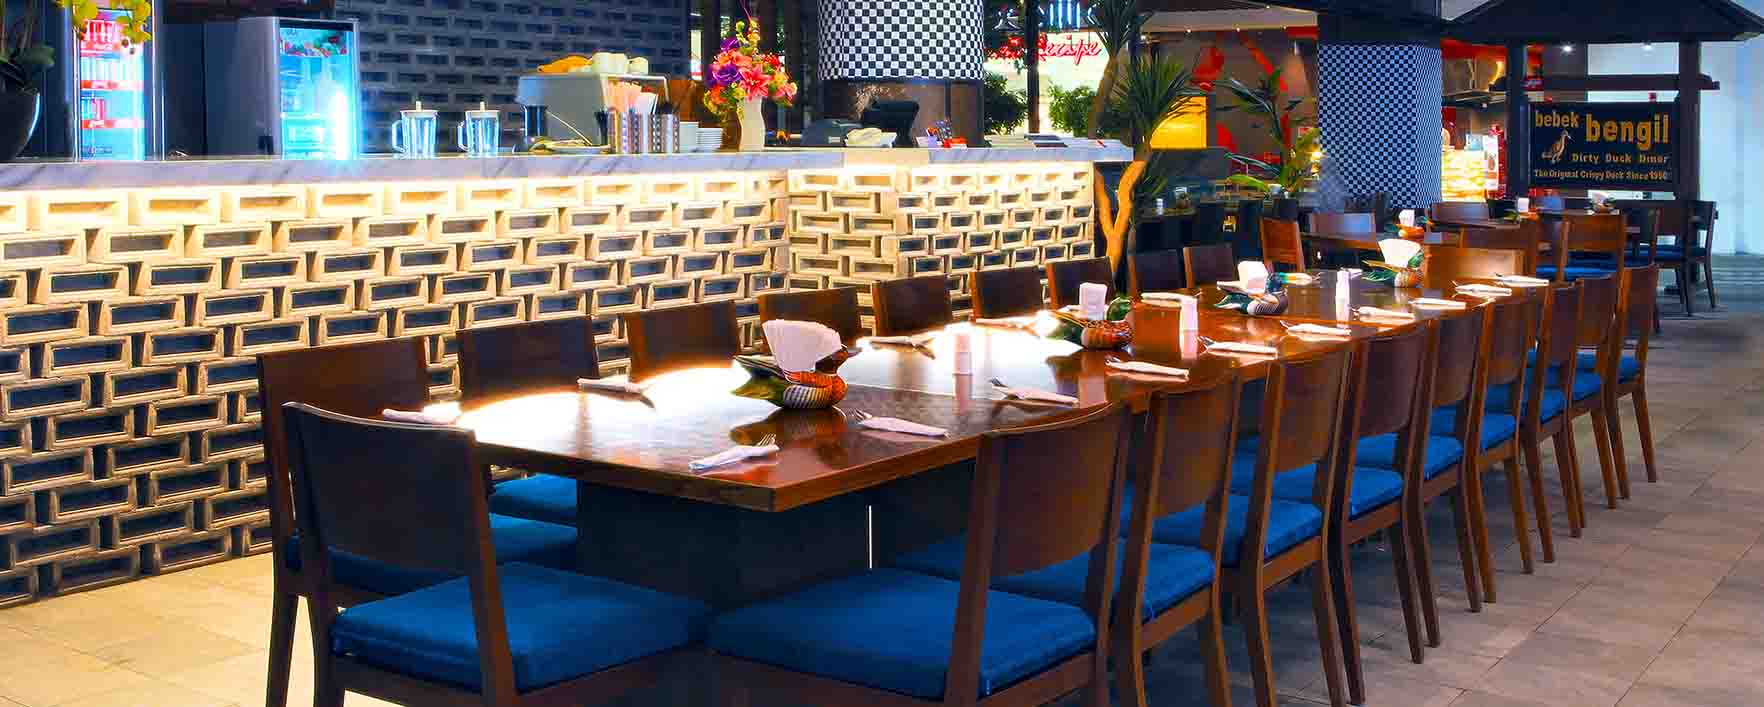 Bebek Bengil Restaurant Gandaria City Mall - Jakarta Selatan